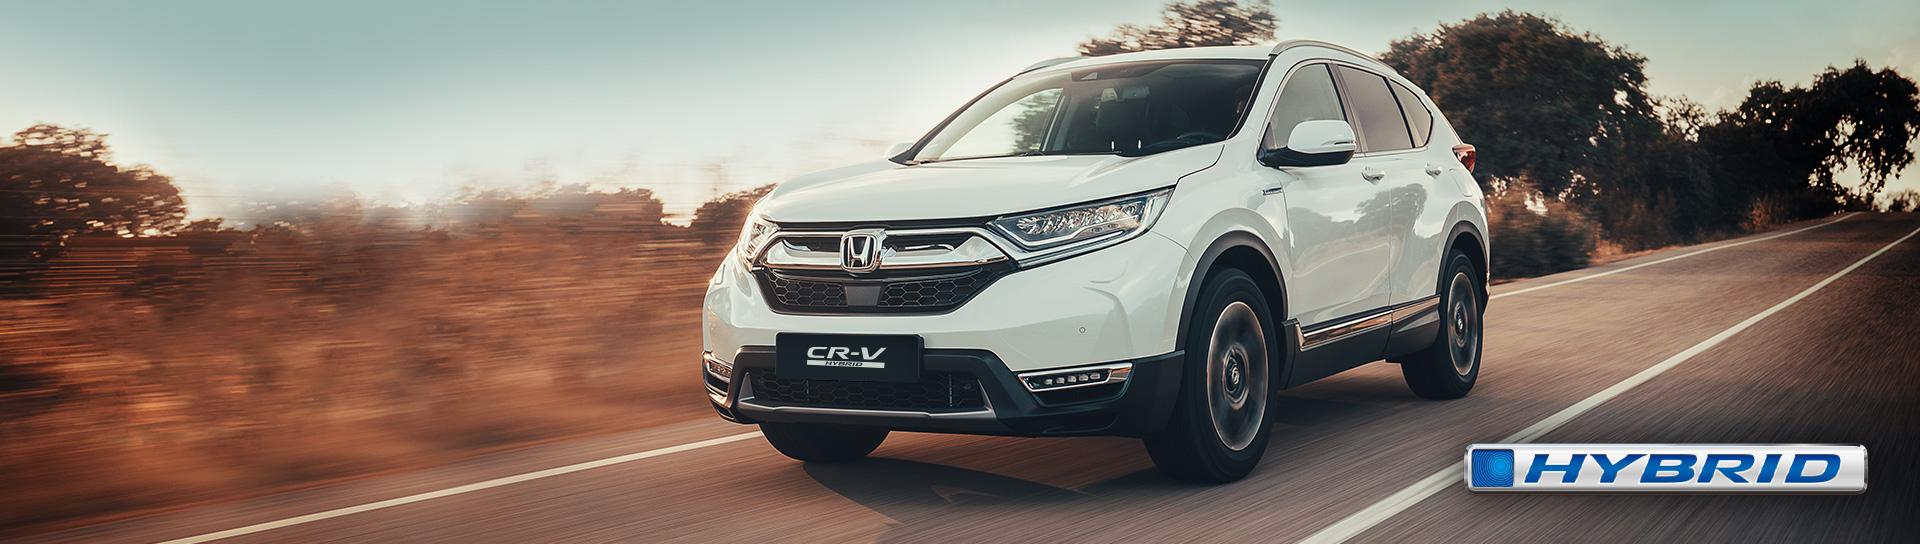 Nouveau Honda CR-V Hybrid